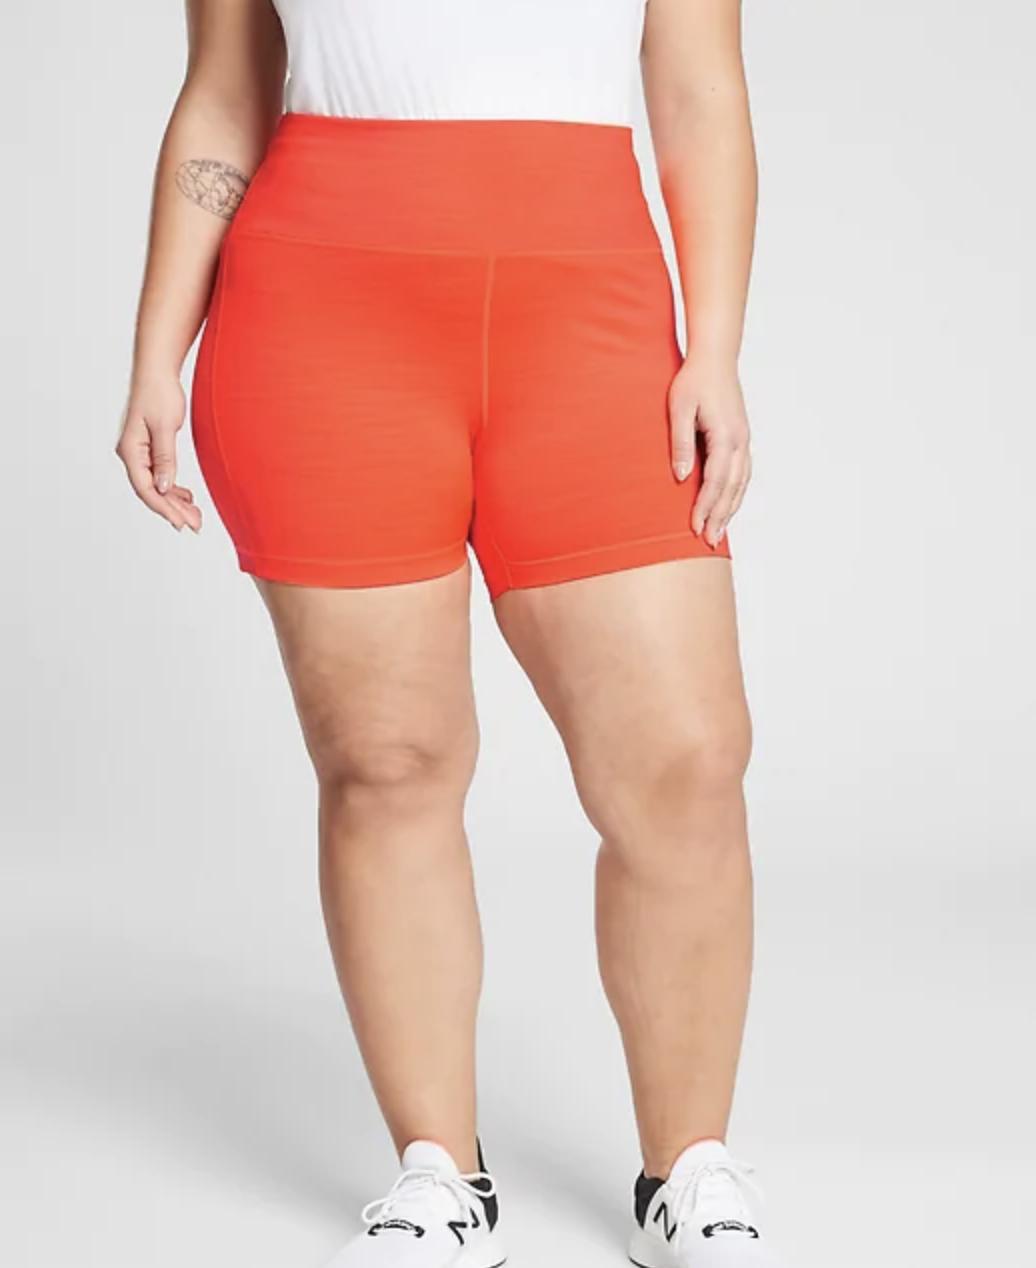 A model in orange high waist bike shorts that fall mid-thigh